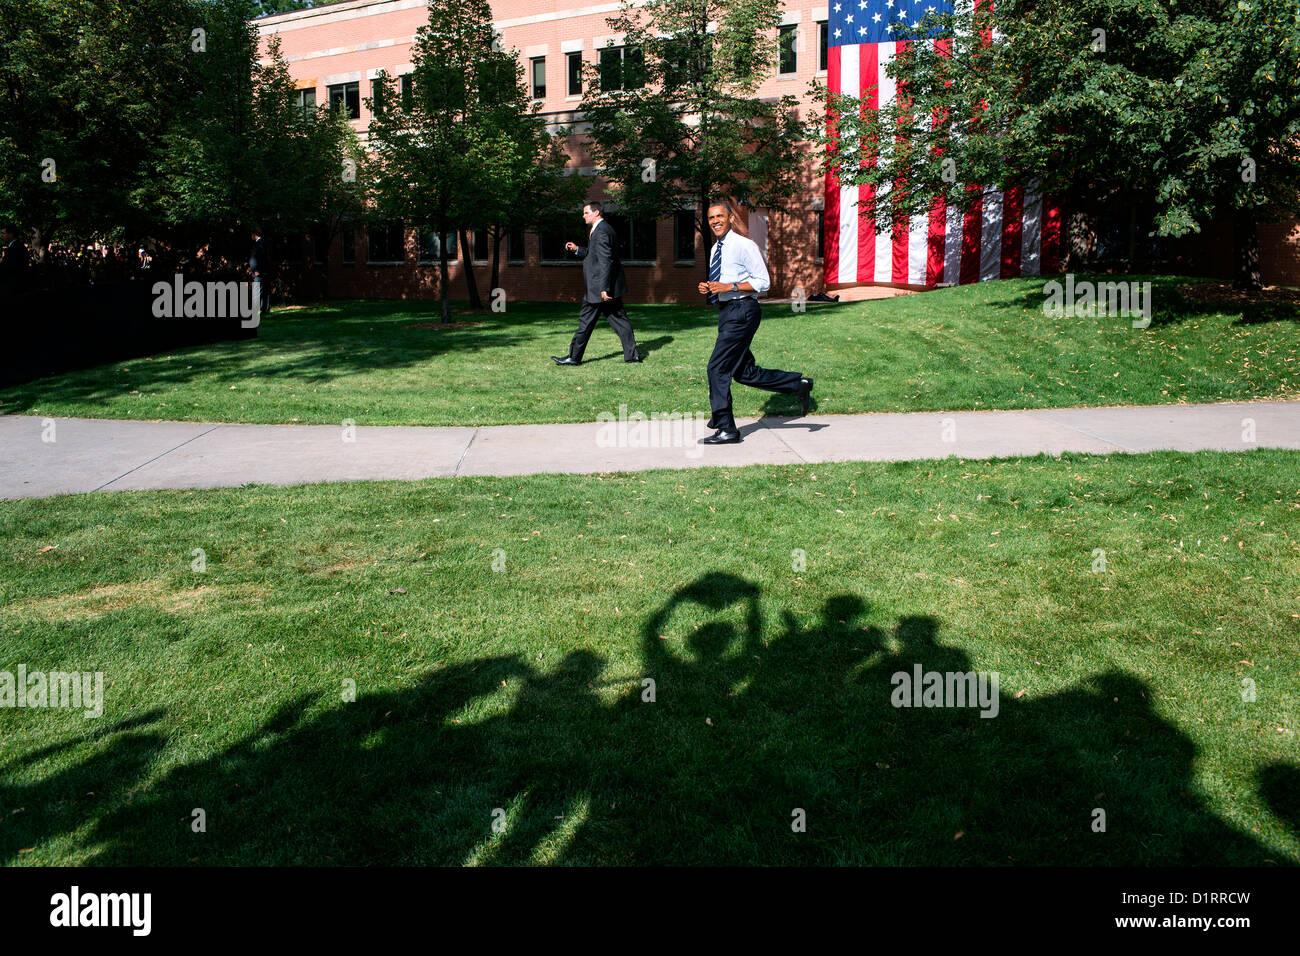 El presidente estadounidense, Barack Obama, sonríe como él pasa vítores partidarios en su camino Imagen De Stock